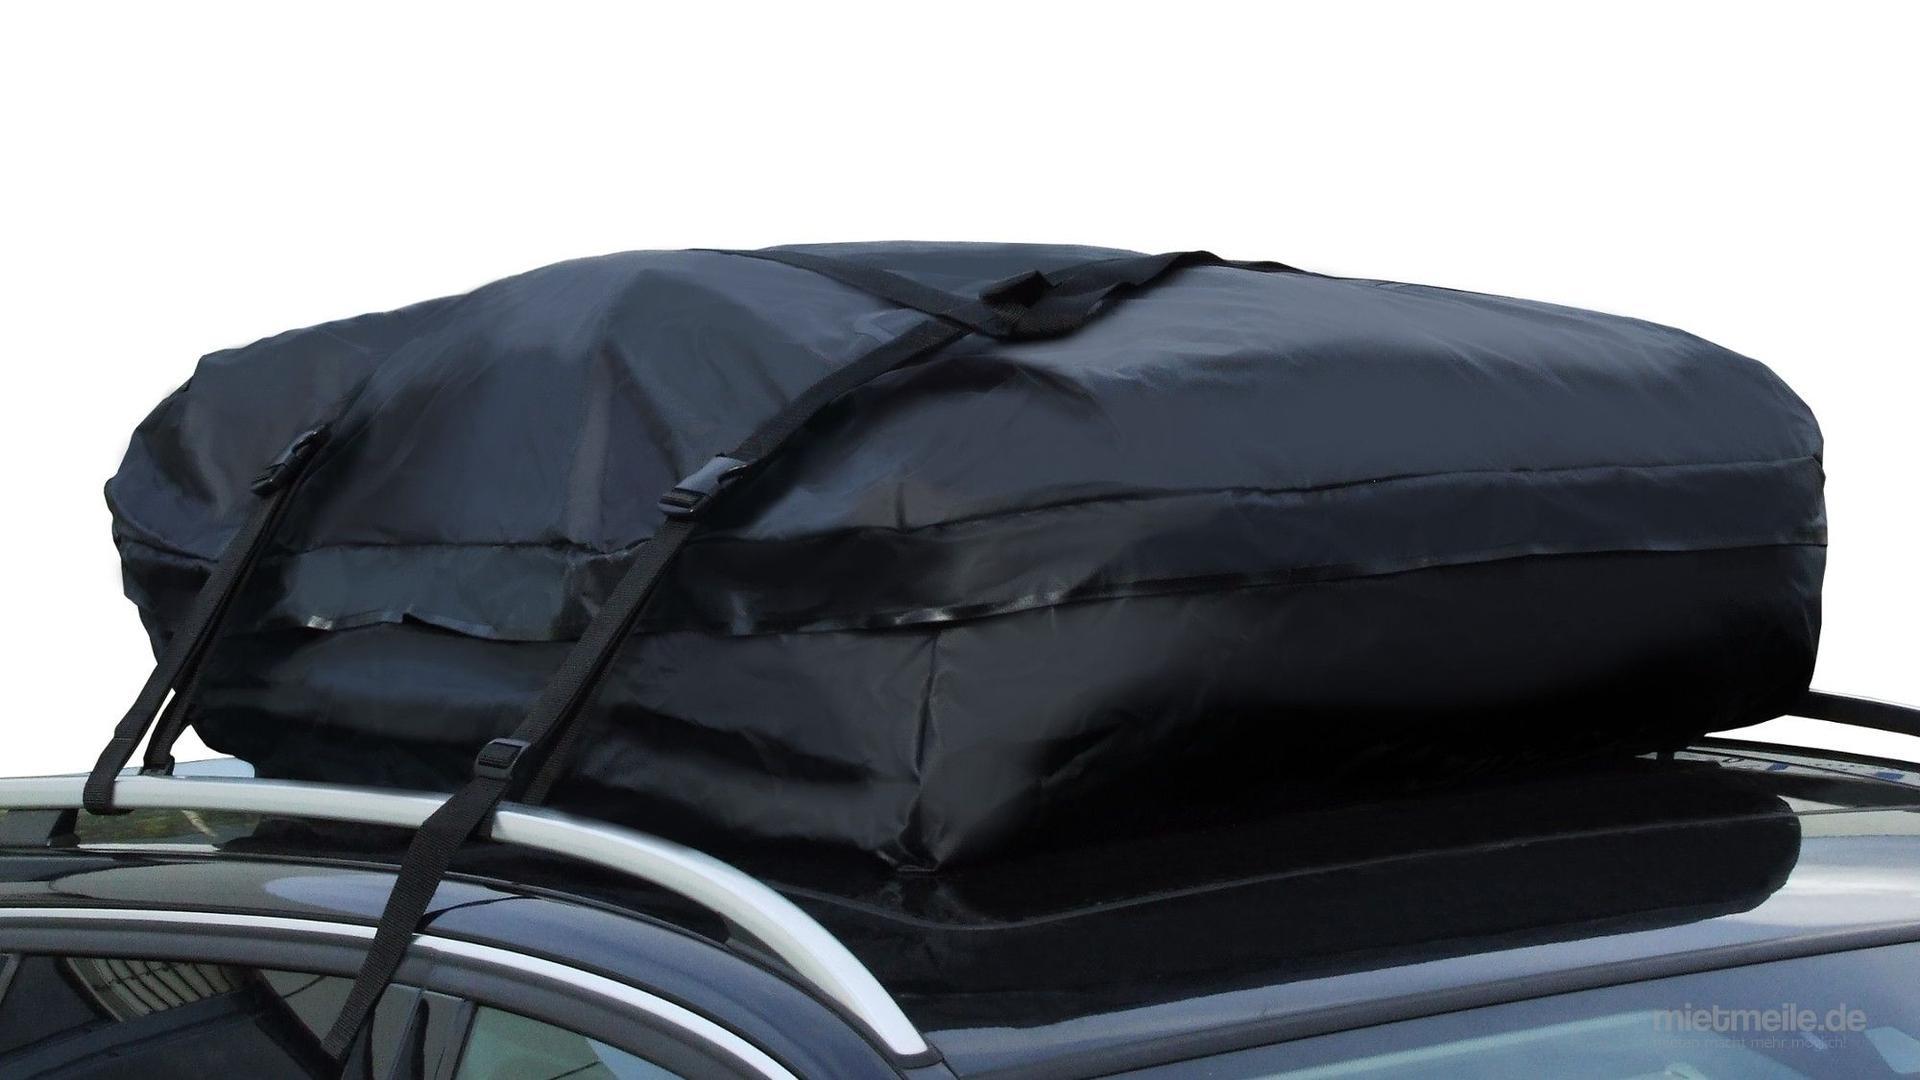 Dachbox mieten & vermieten - Dachbox 425 L XL Dach-Tasche faltbar mieten aus-leihen Verleih in Schkeuditz